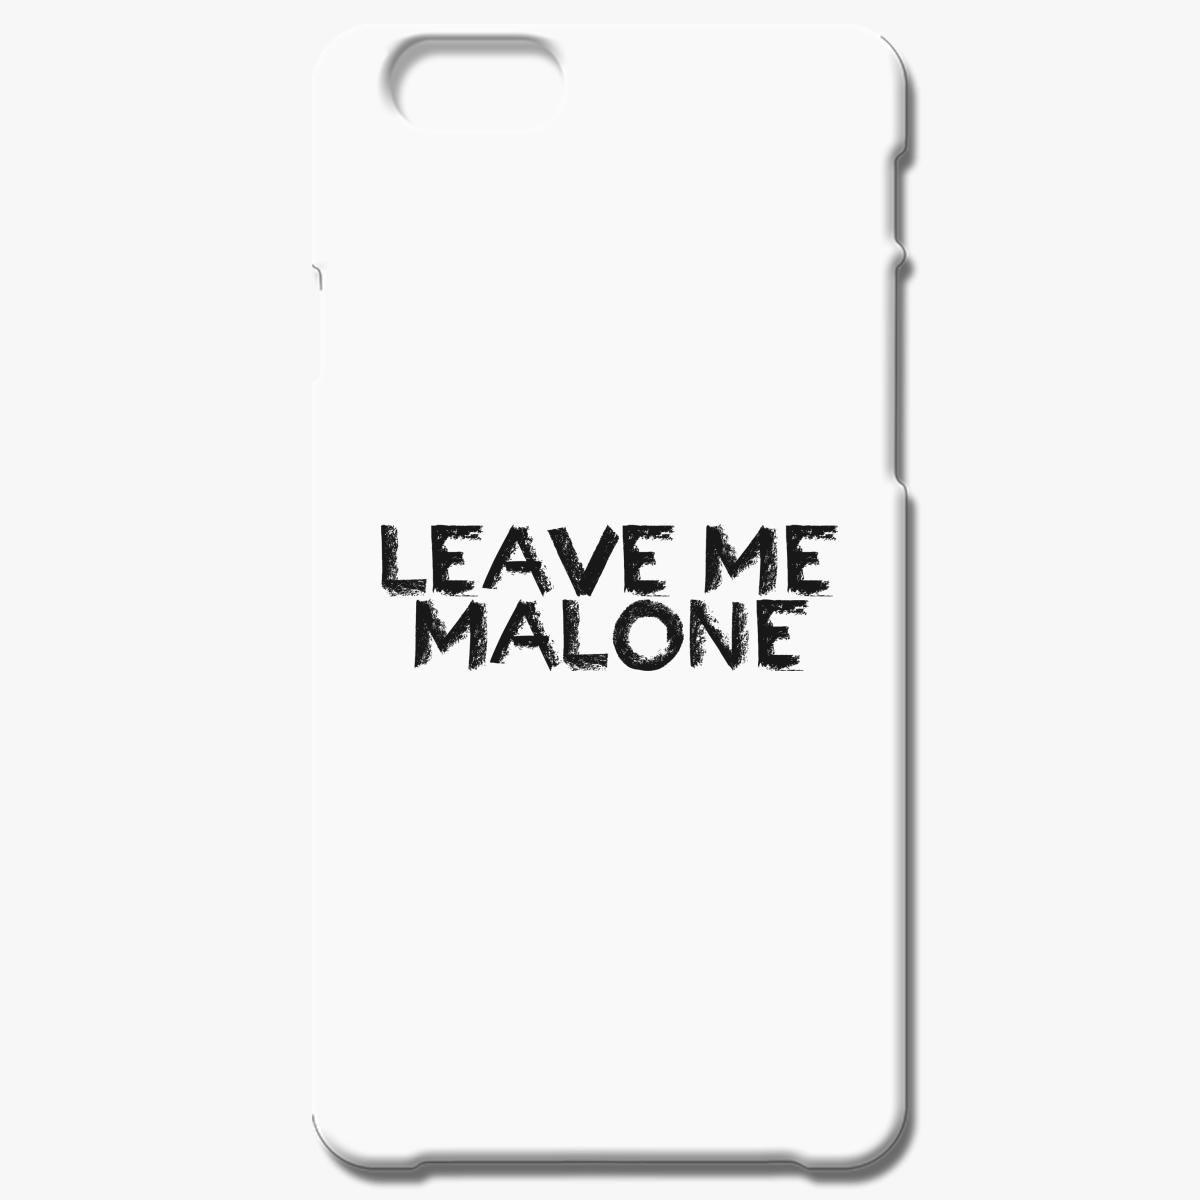 b397725453c0 Leave Me Malone iPhone 6/6S Case - Customon